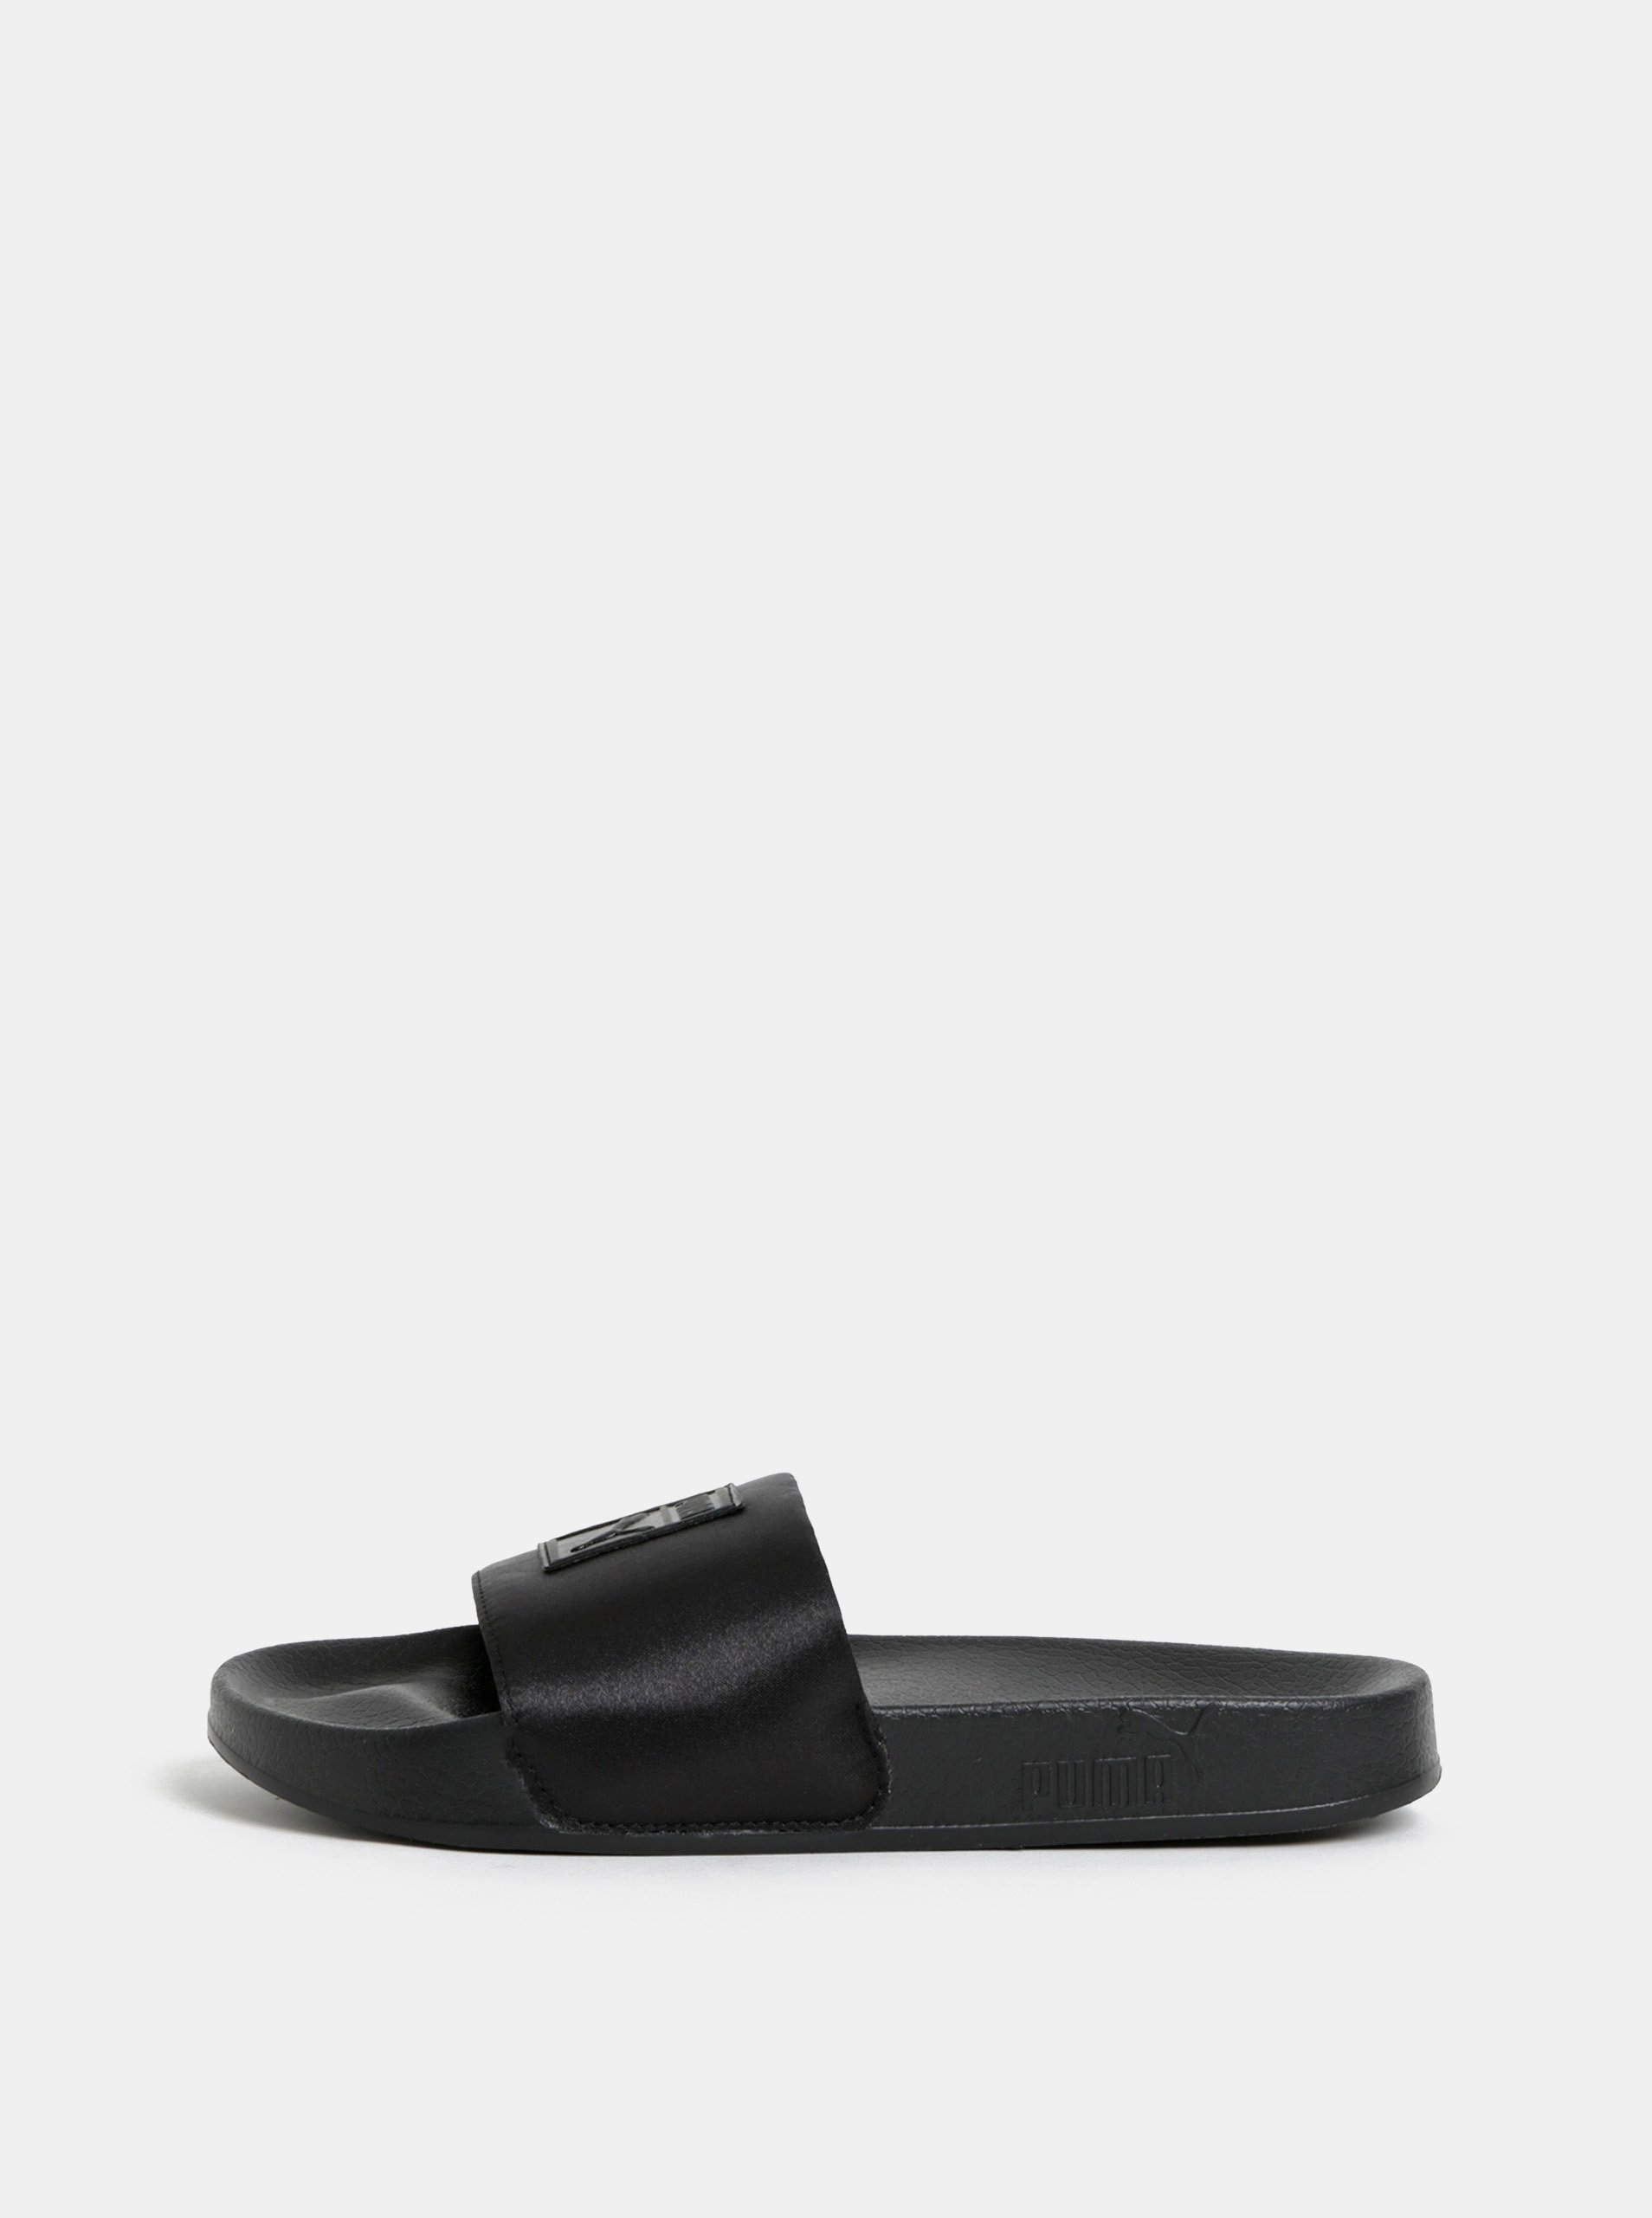 4df66973399 Černé dámské lesklé pantofle s plastickým logem Puma Leadcat